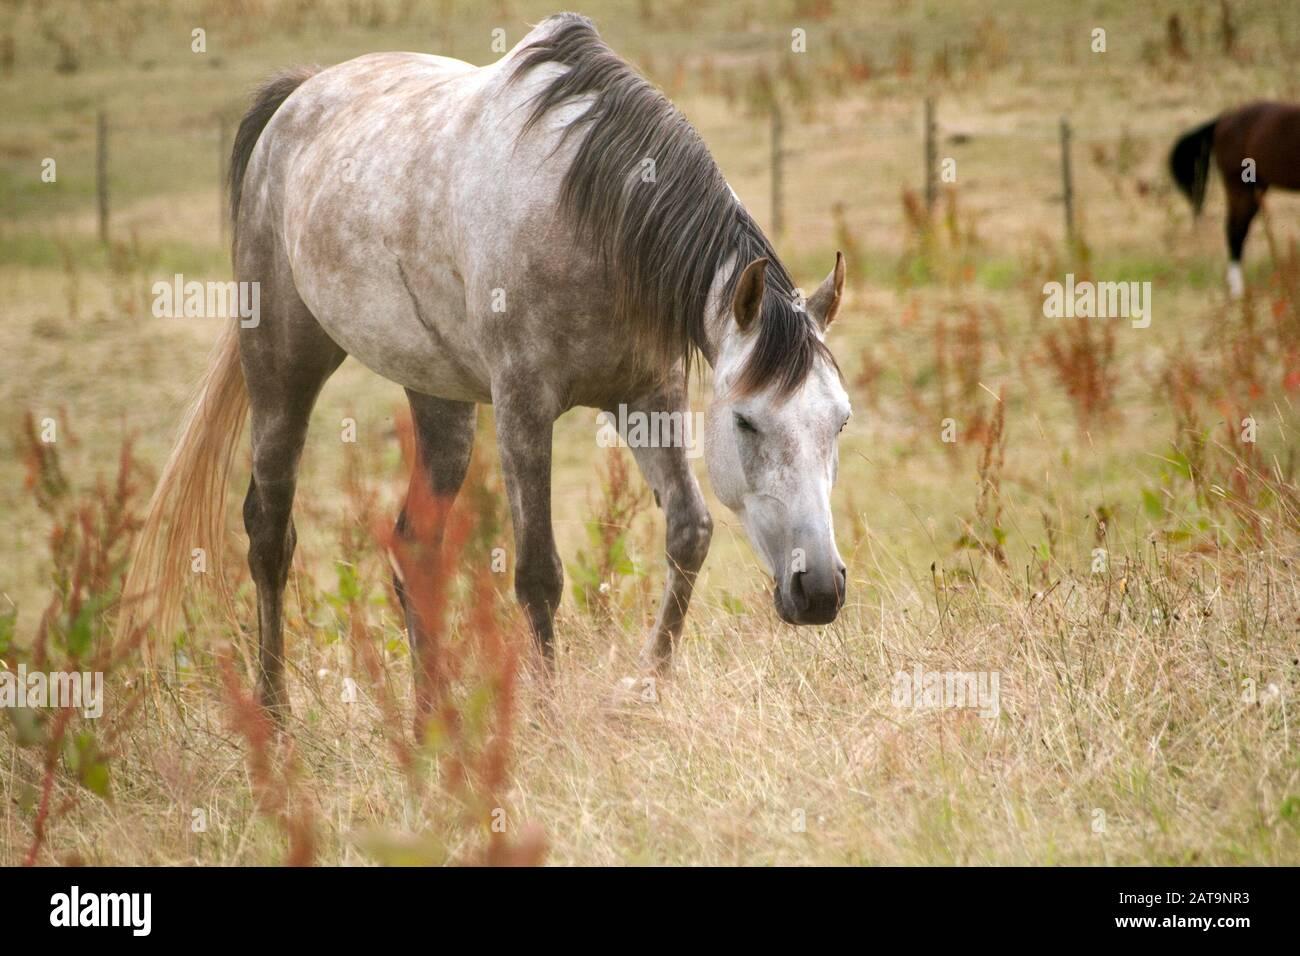 Dapple Grey Arab Horse In Meadow Stock Photo Alamy